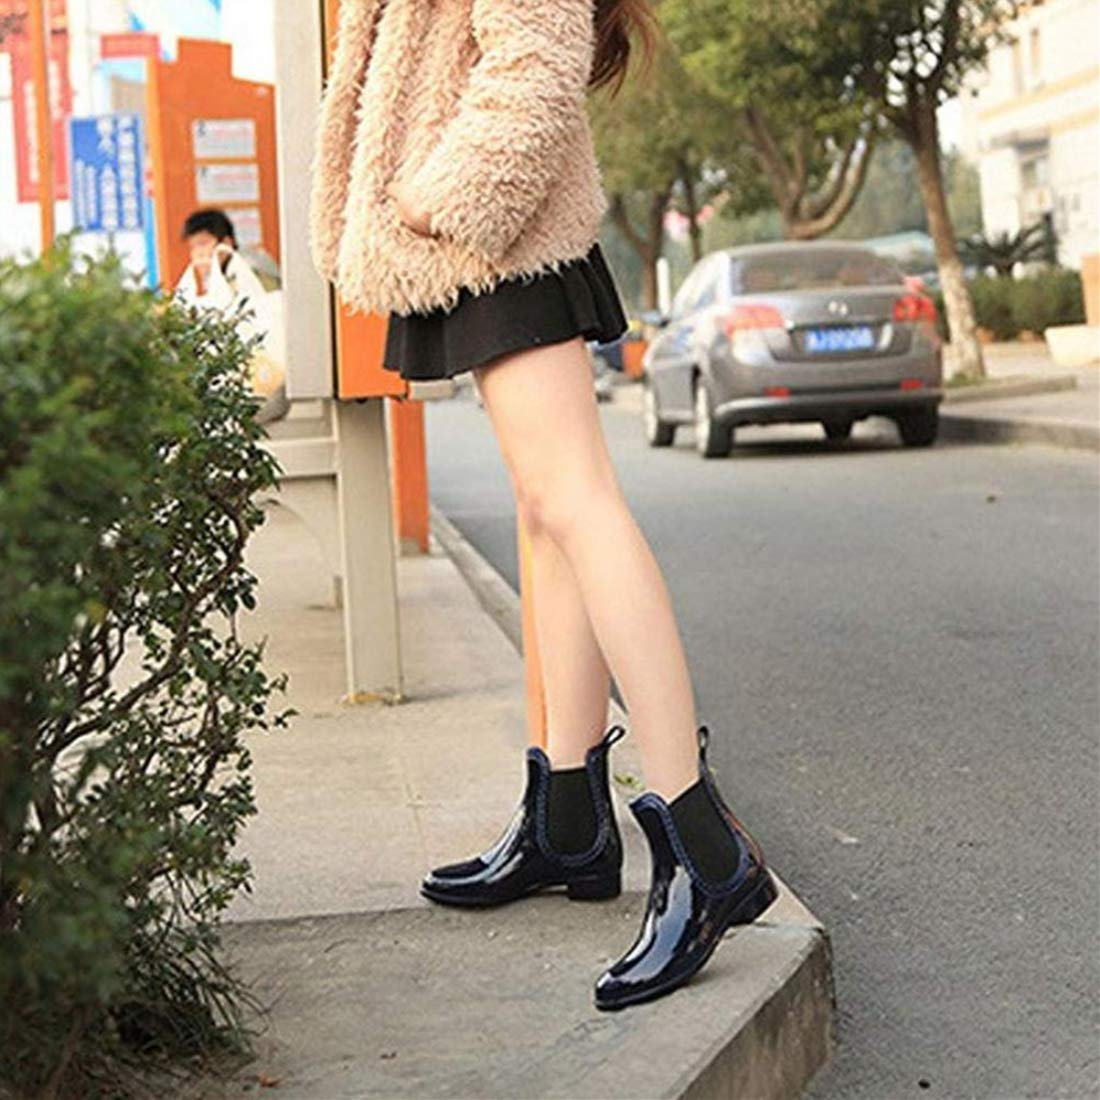 SYLPHID Womens Rain Boots Ladies Elastic Chelsea Rain Booties Shiny Waterproof Non Slip Ankle Rain Shoes